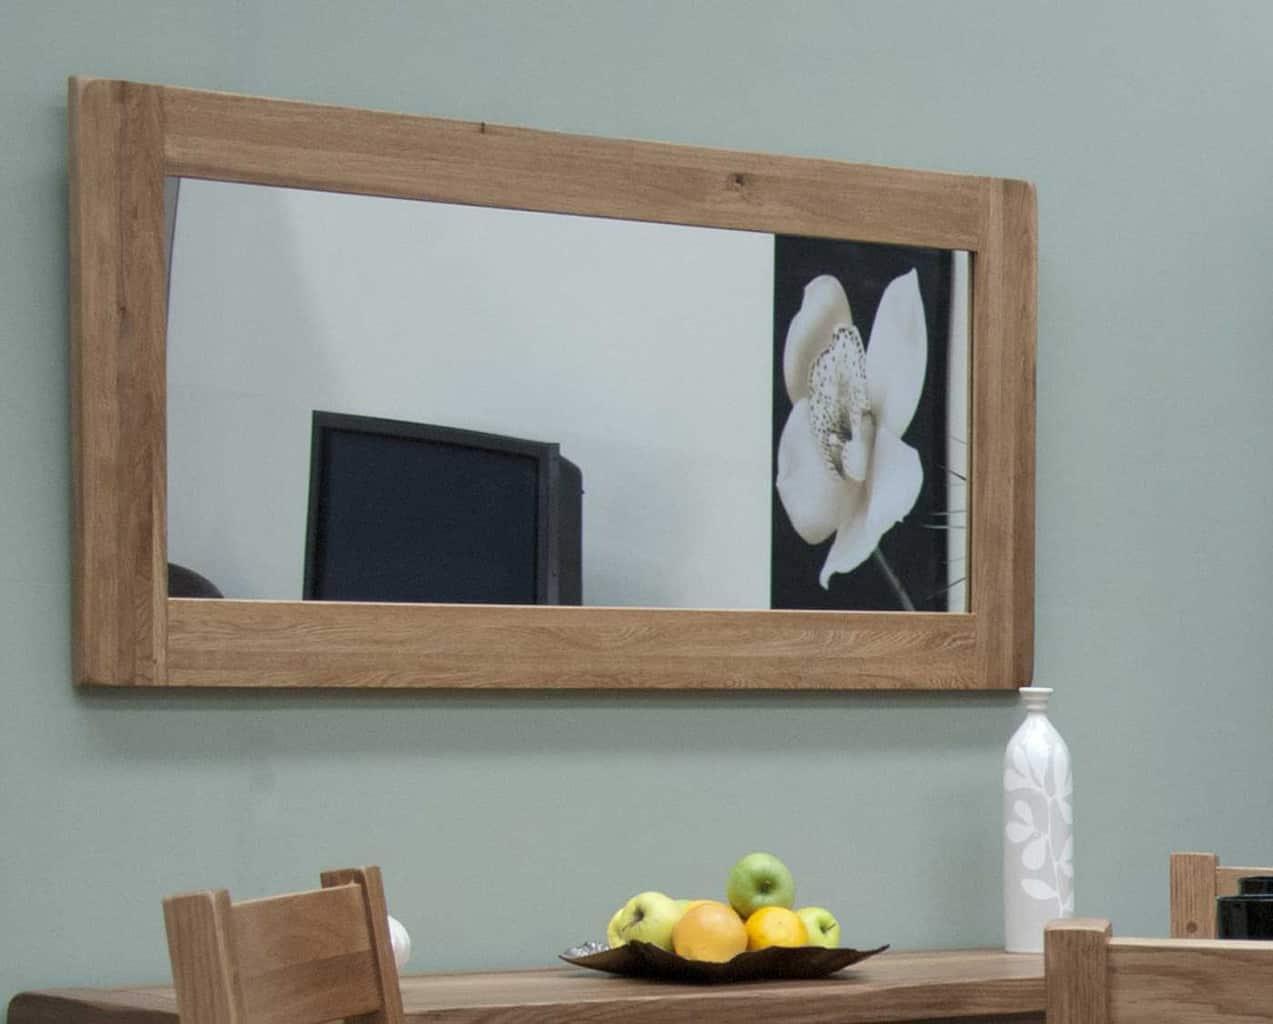 Original Rustic Solid Oak Large Mirror